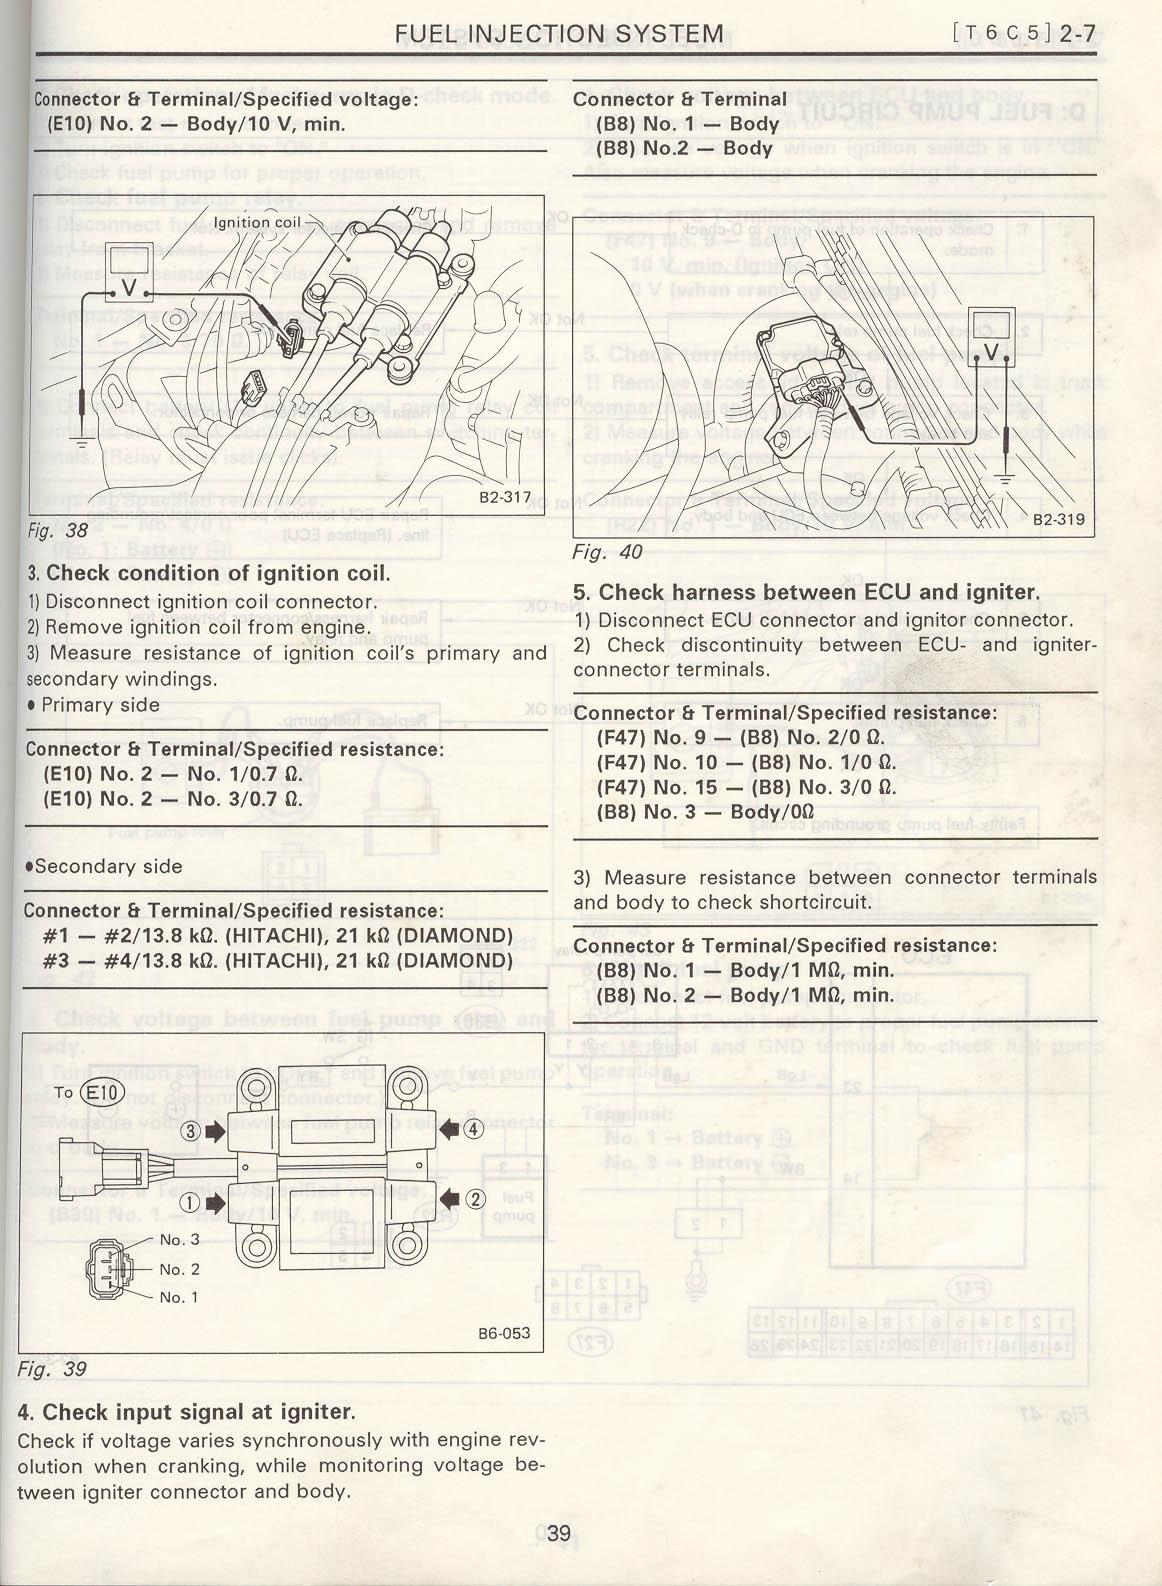 Engine light P1507-subarucoiltest.jpg